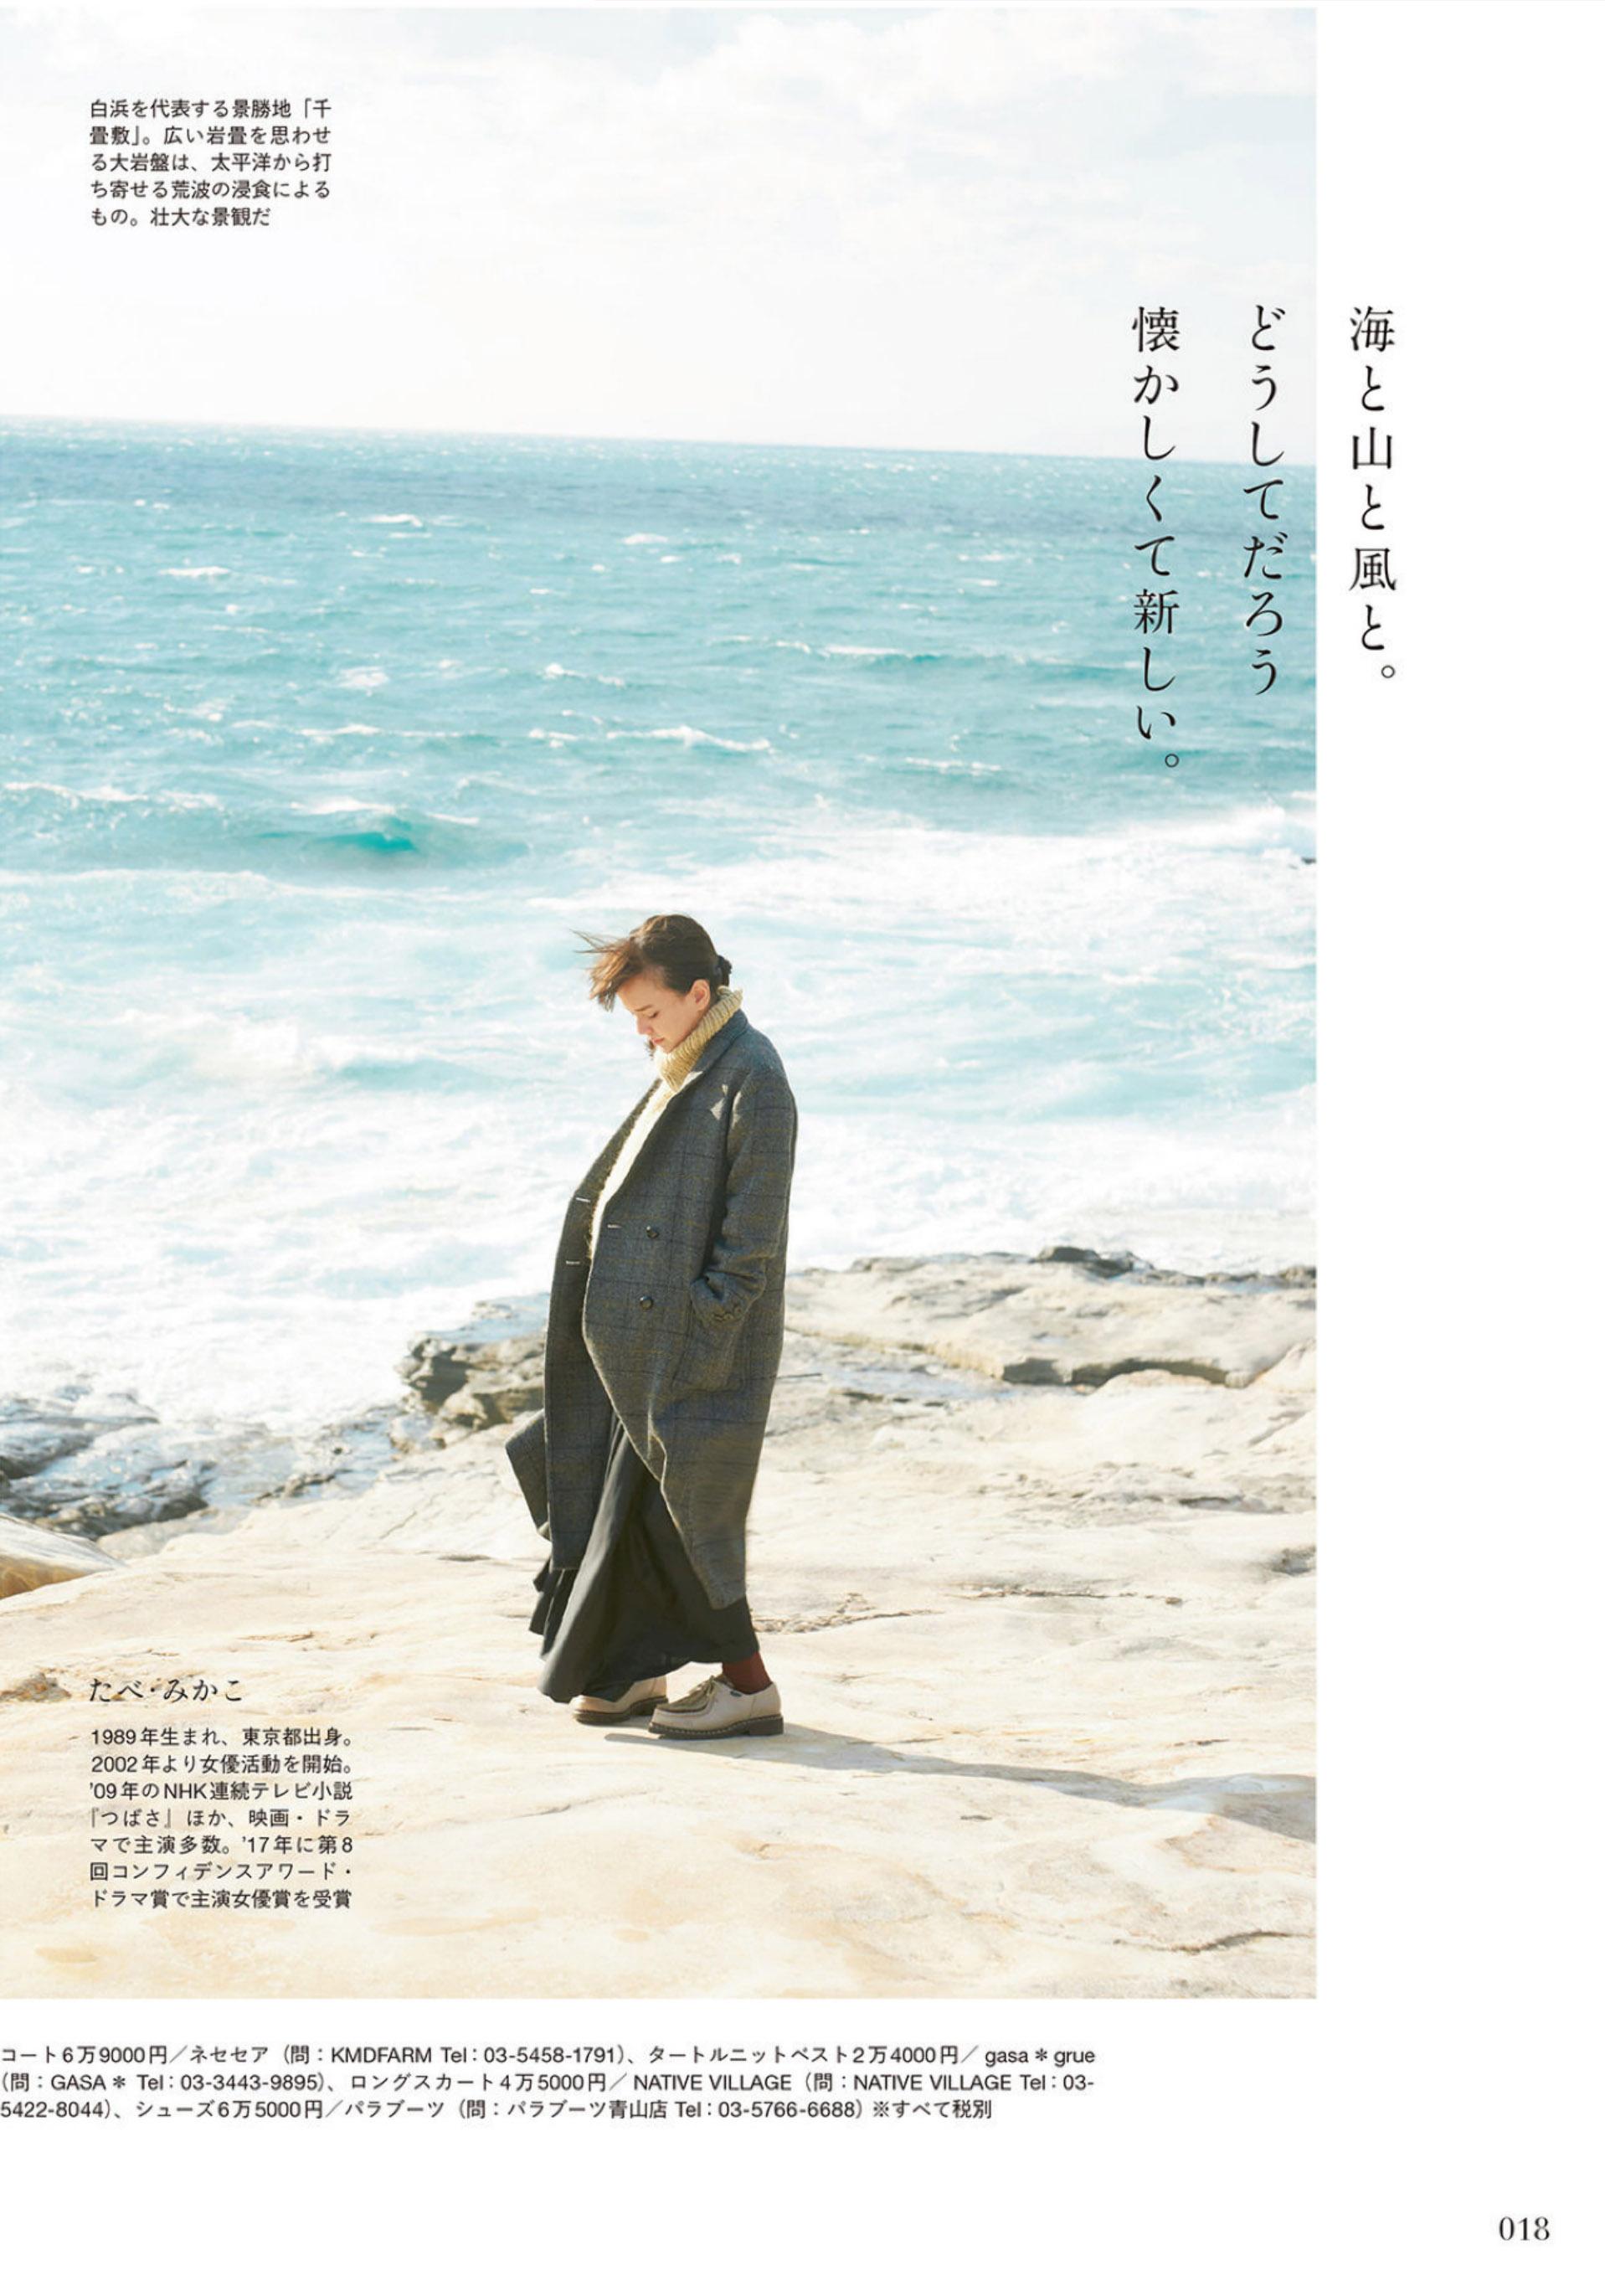 Discover Japan 3月号05